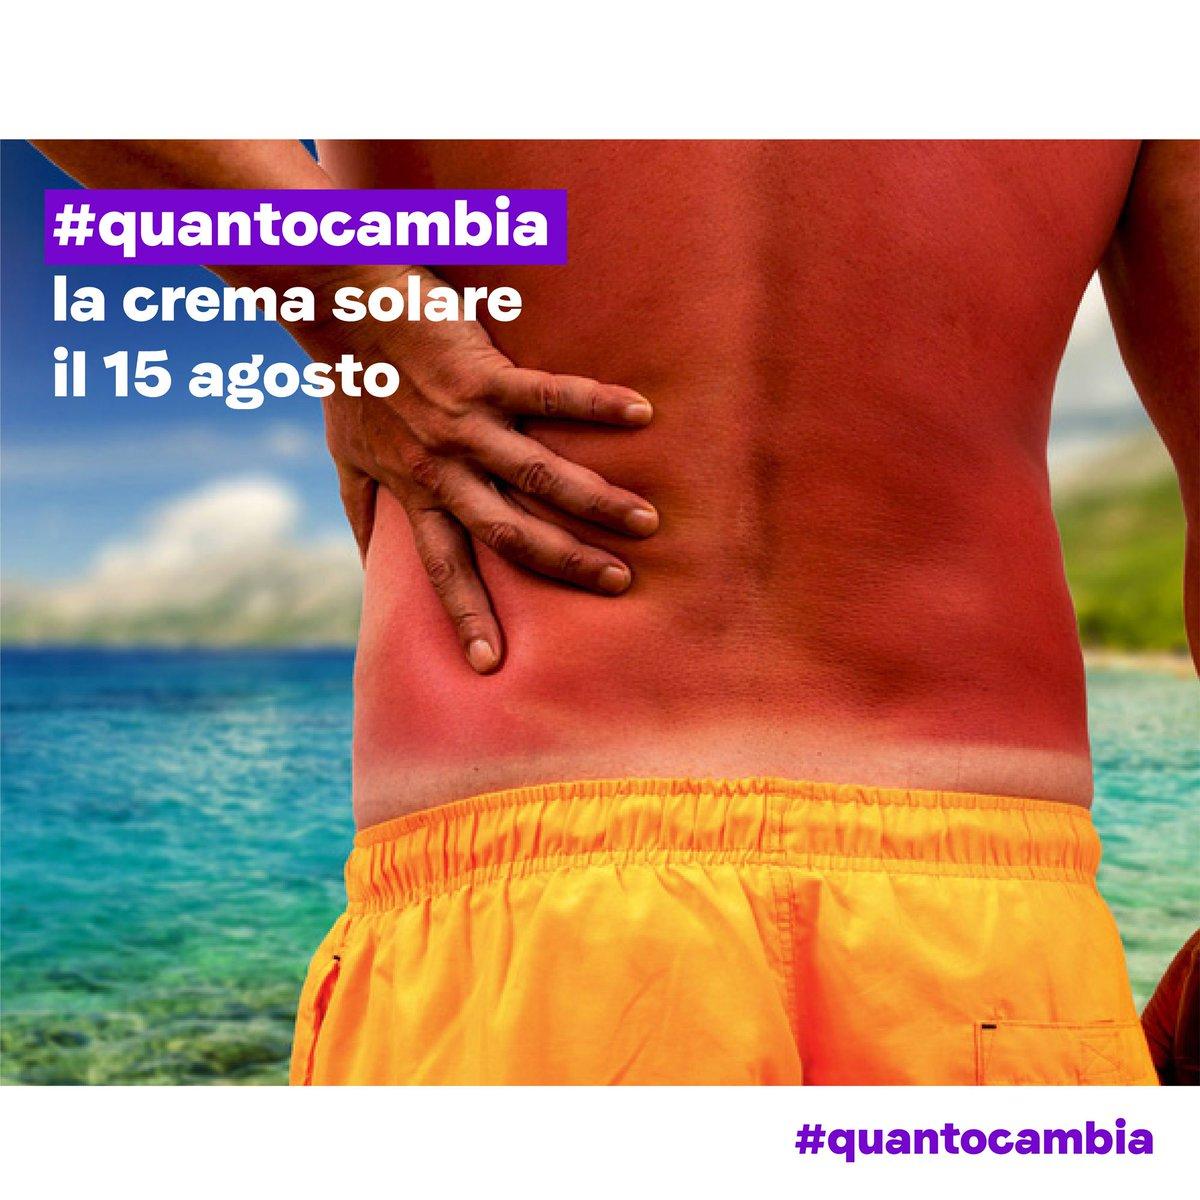 Mare o montagna? #quantocambia @FondazioneCarig #prendersicuradisè #risorseadeguatepic.twitter.com/59QqziWkzU